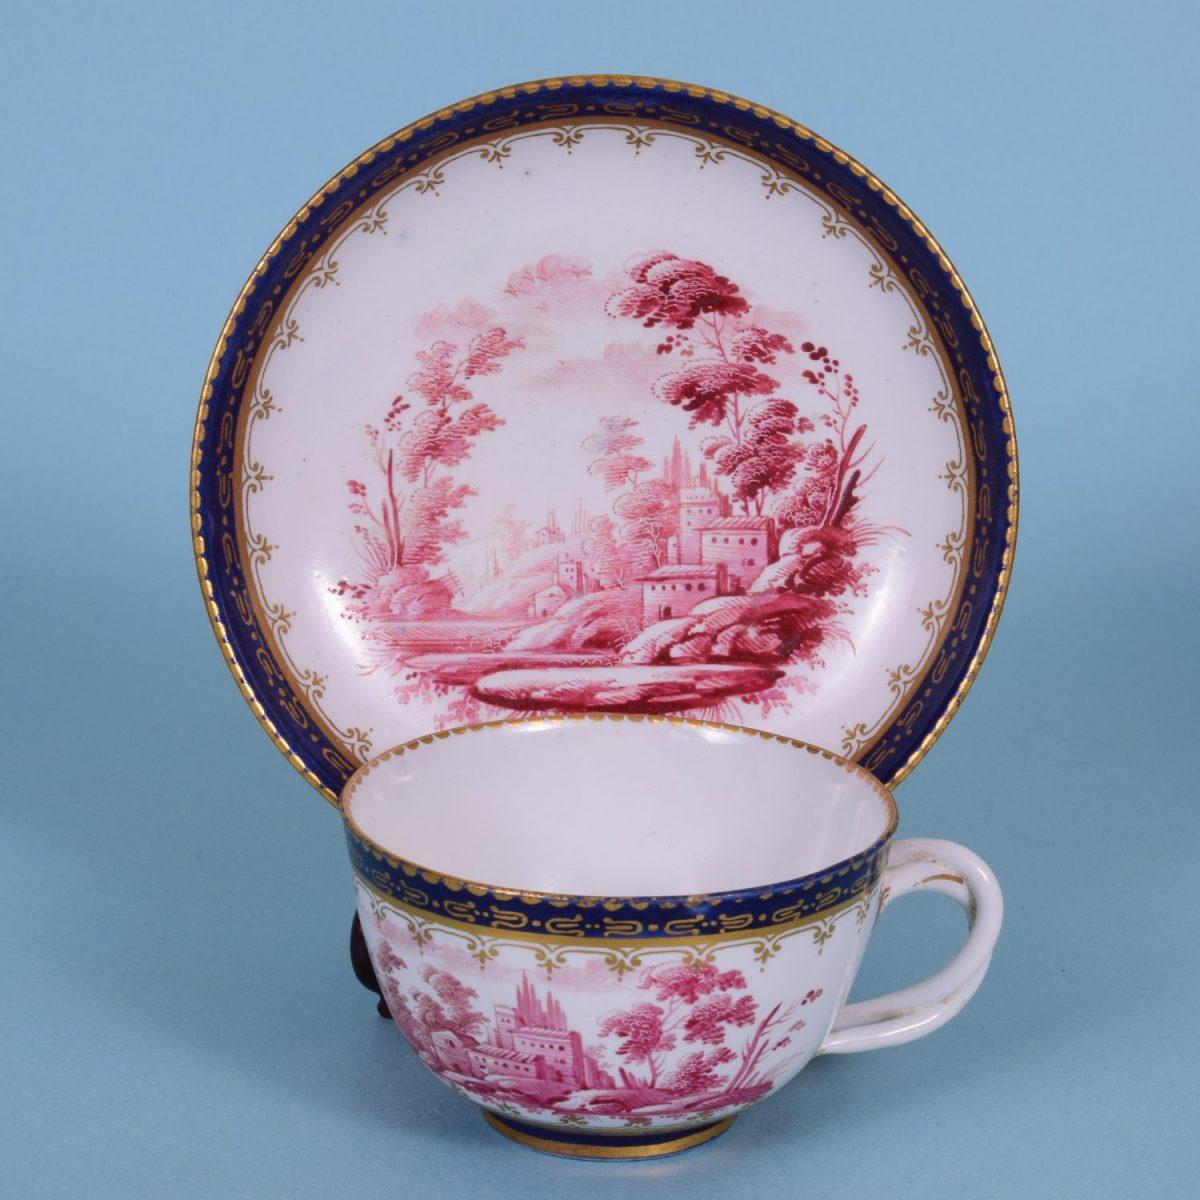 C18th Italian Porcelain Tea Cup & Saucer, c1780